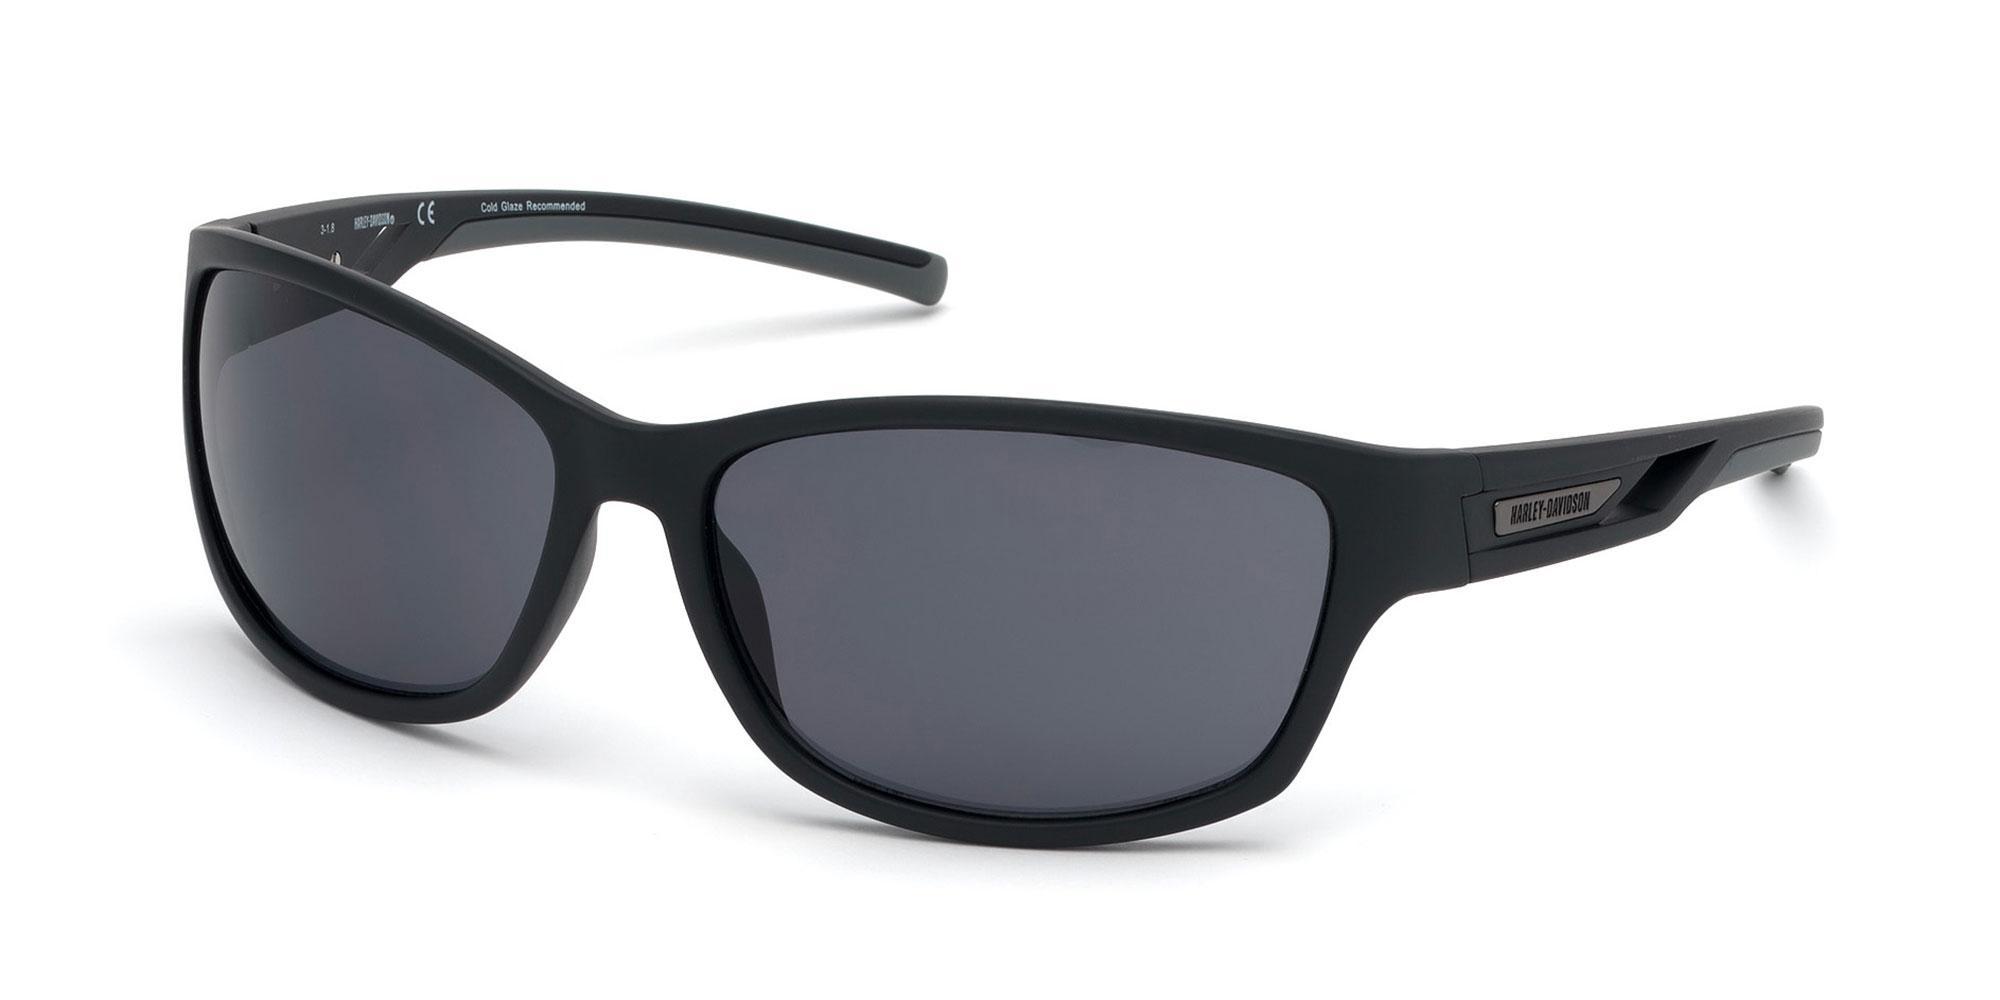 02A HD0925X Sunglasses, Harley Davidson